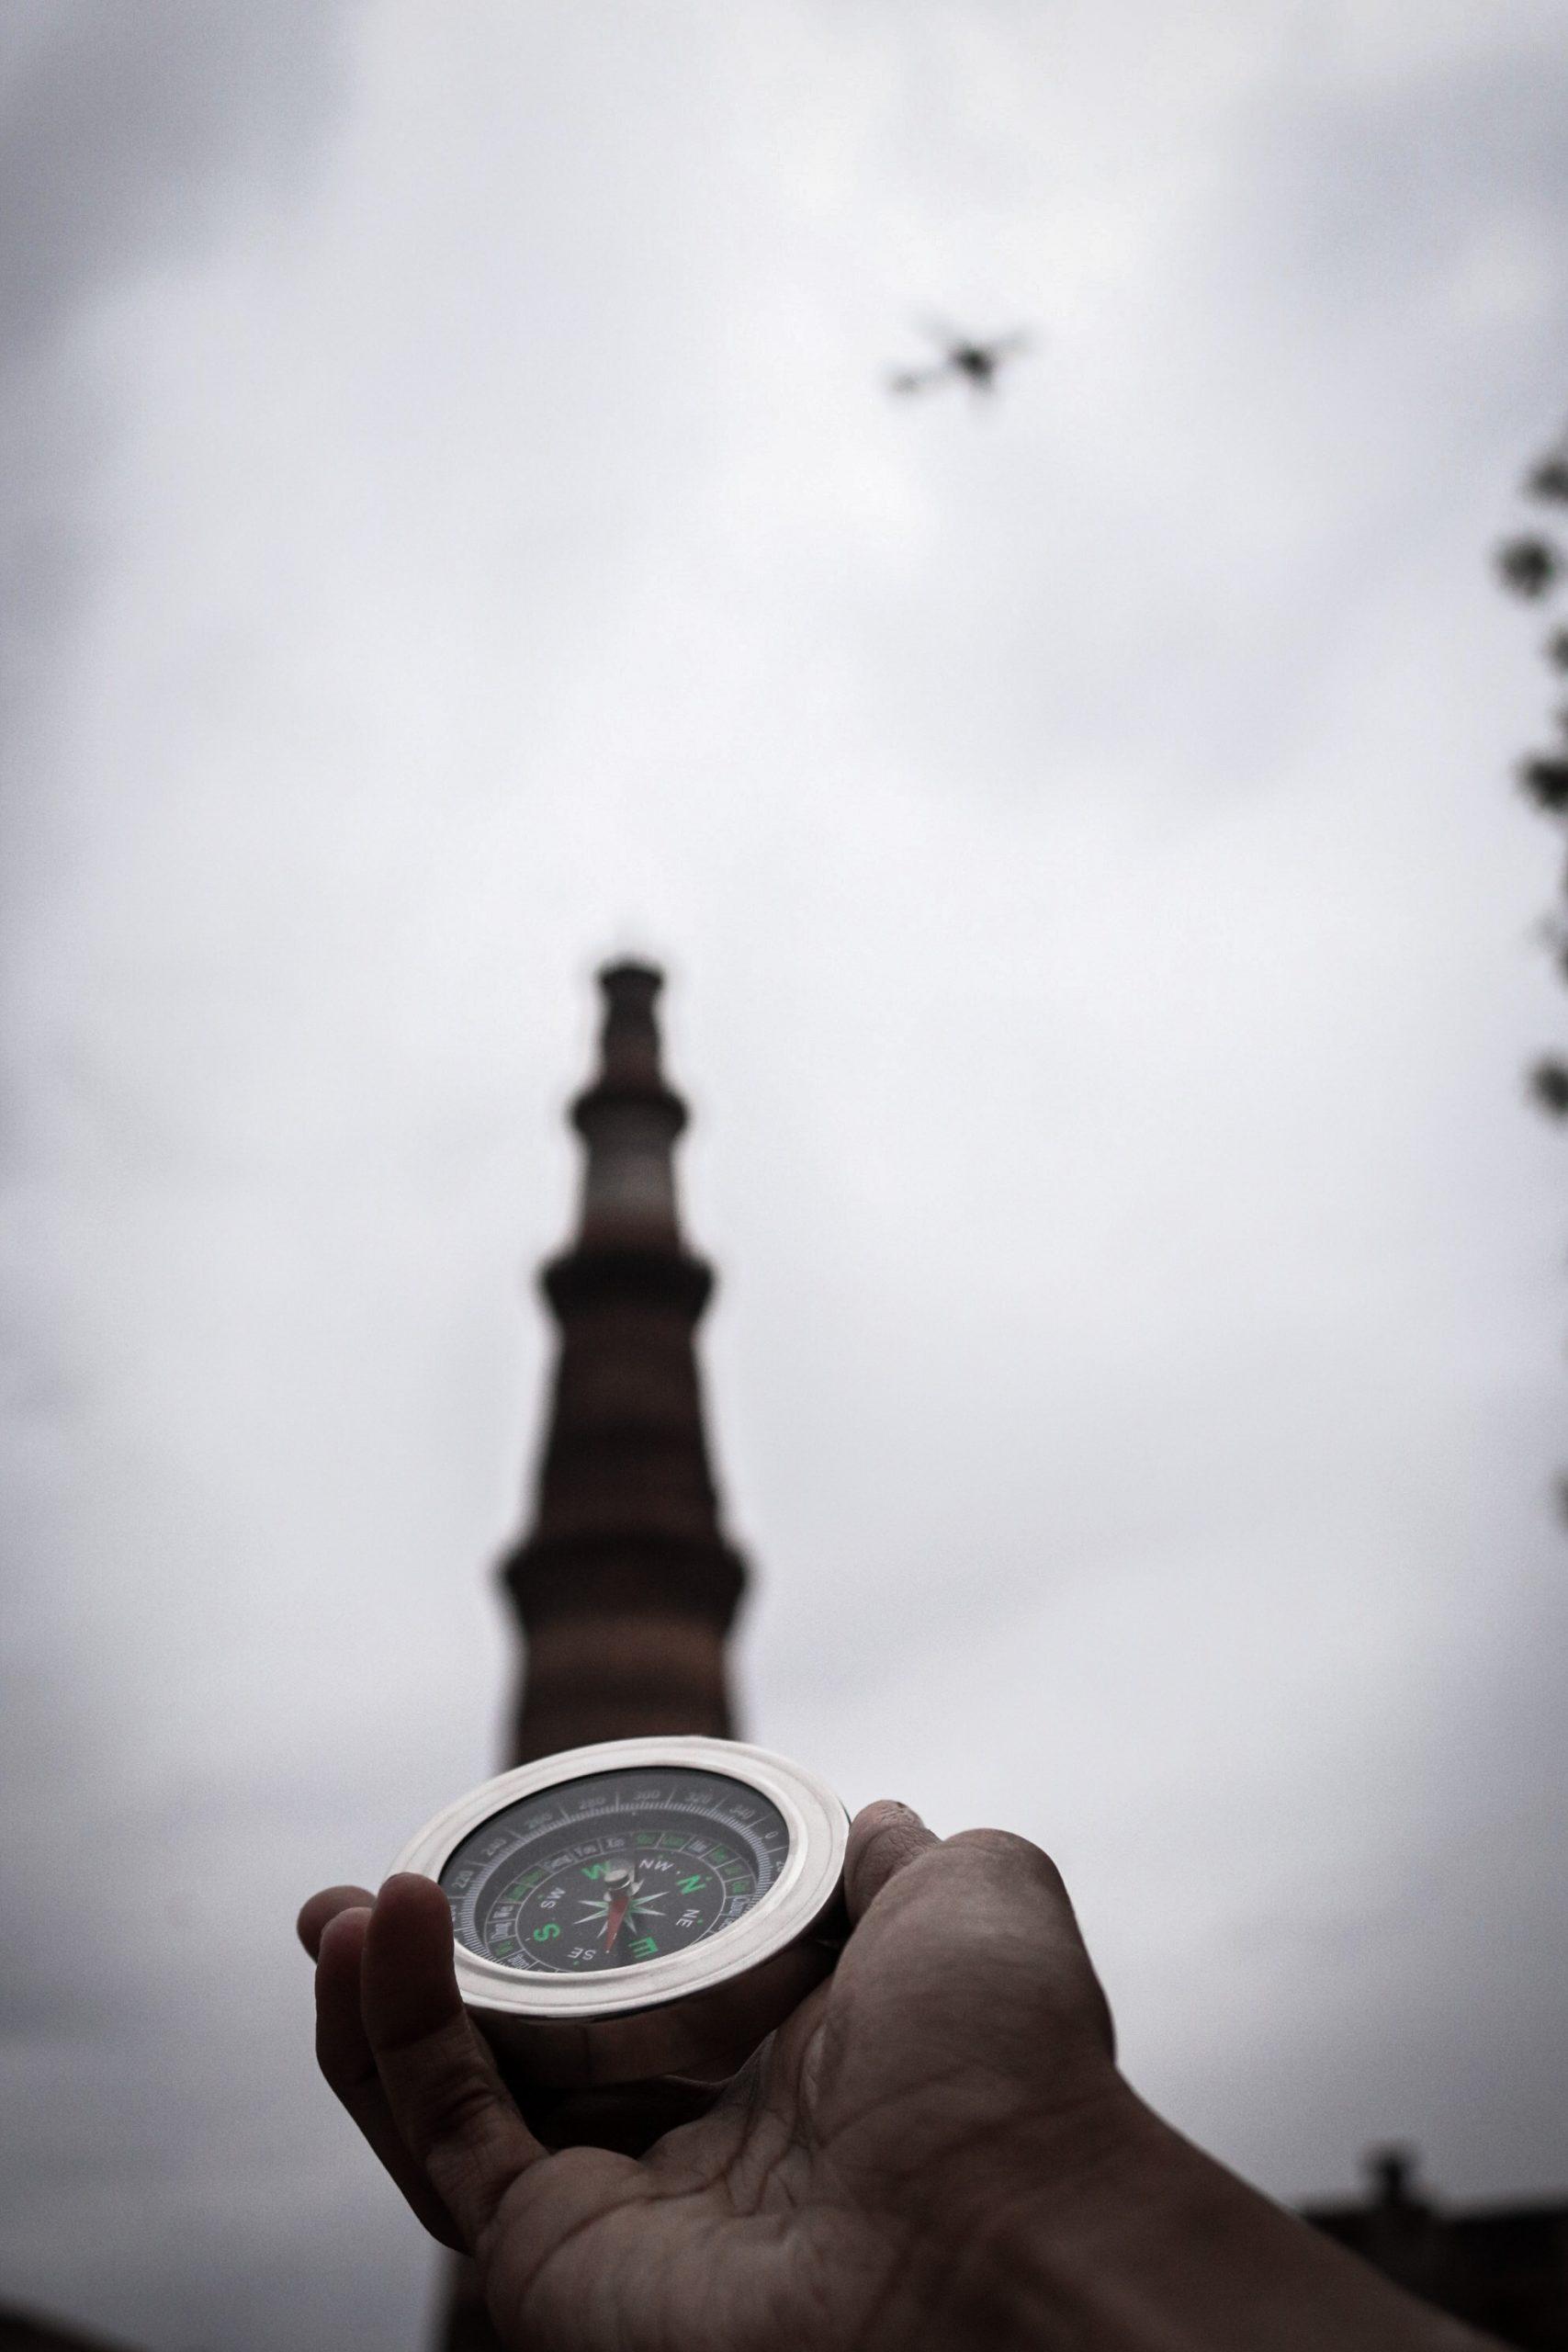 Qutab minar and compass